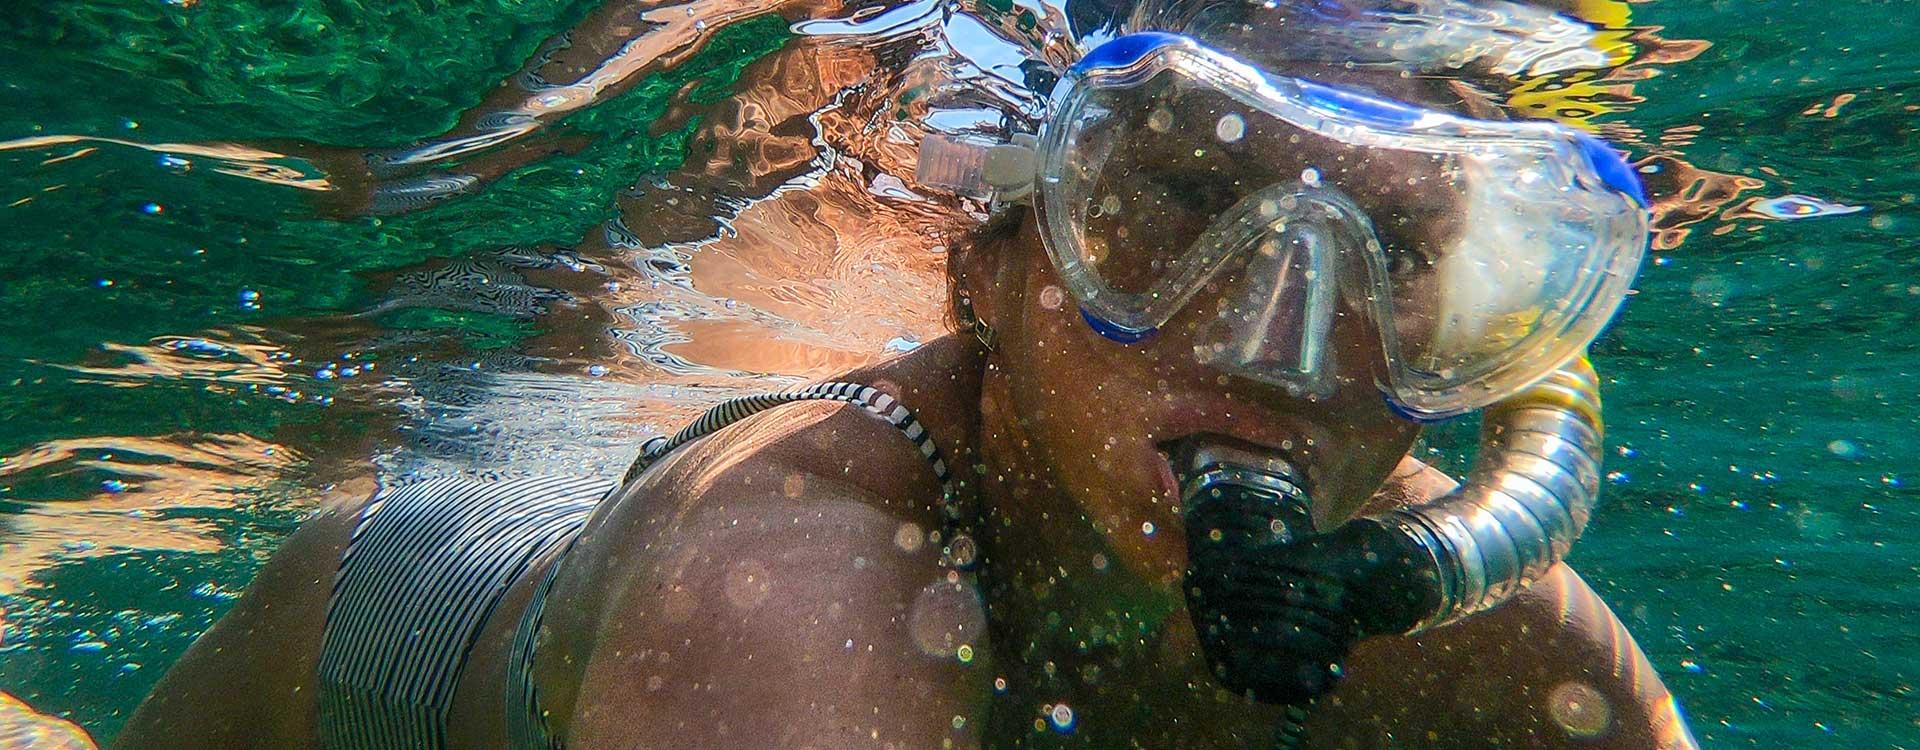 Snorkeling at Pirates' Caves